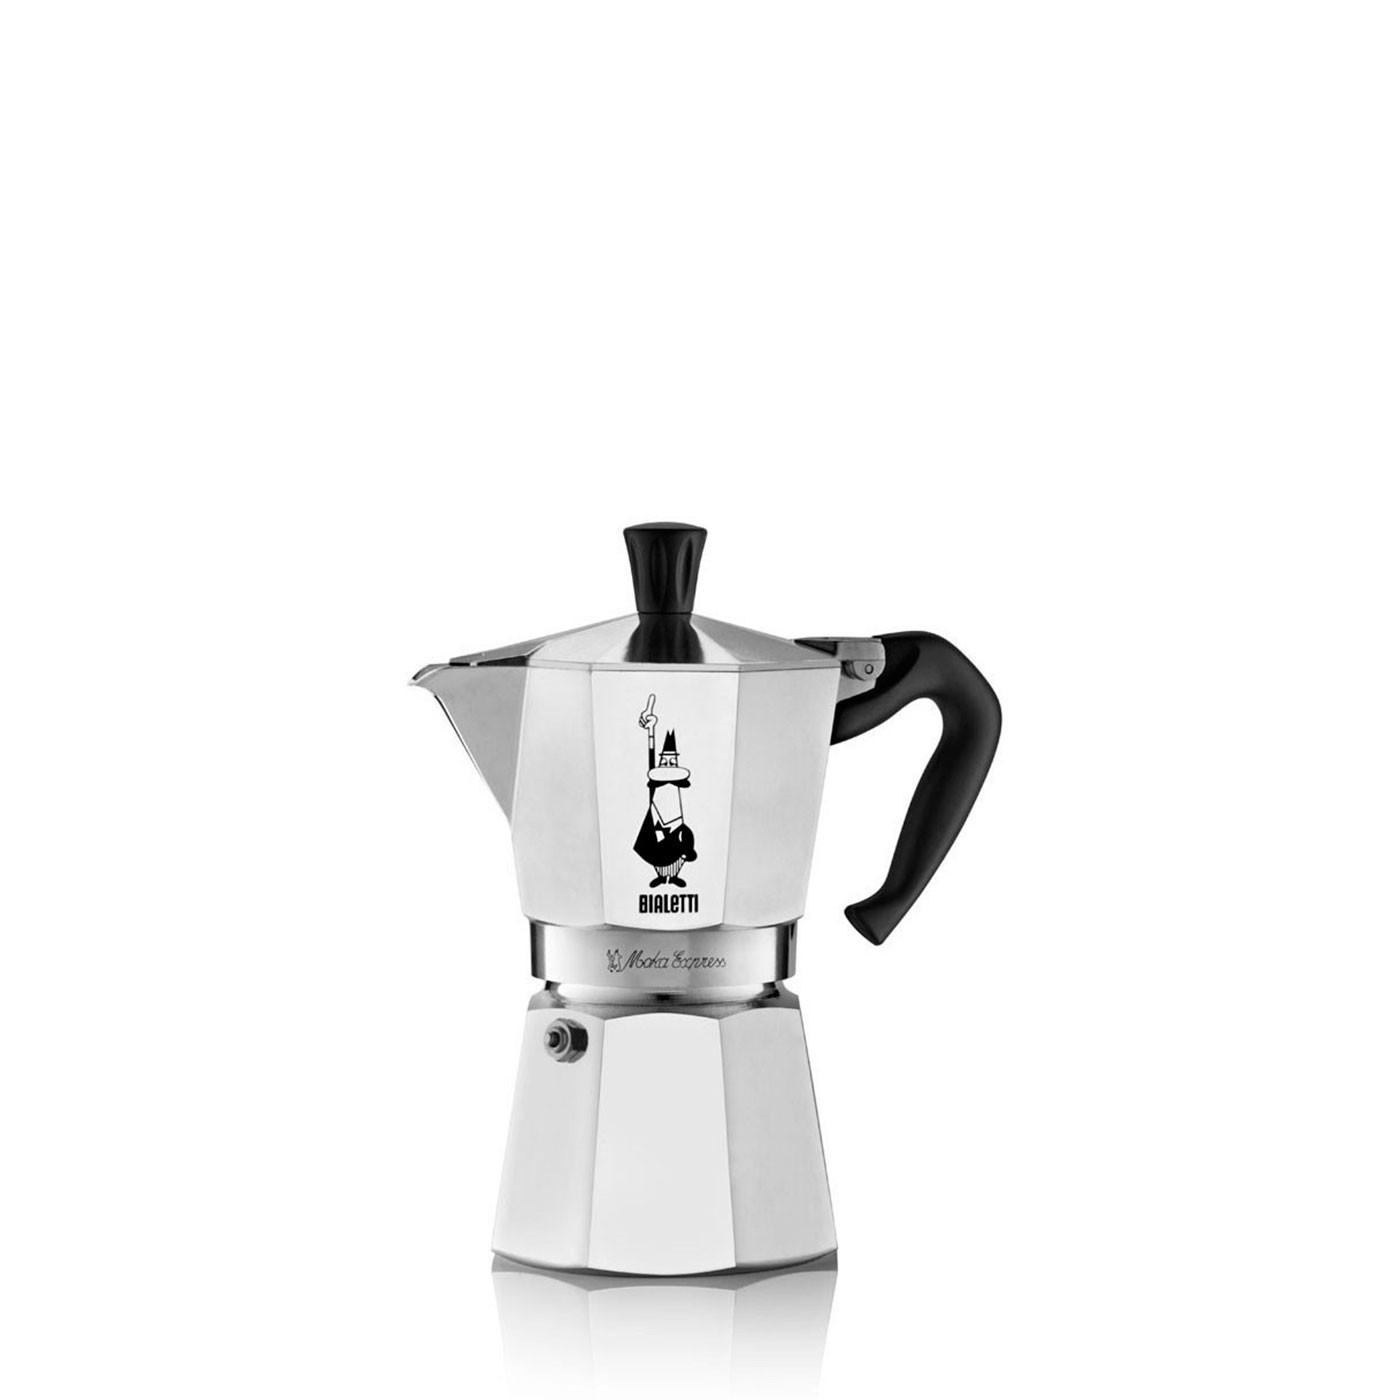 Moka Espresso - 6 Cups